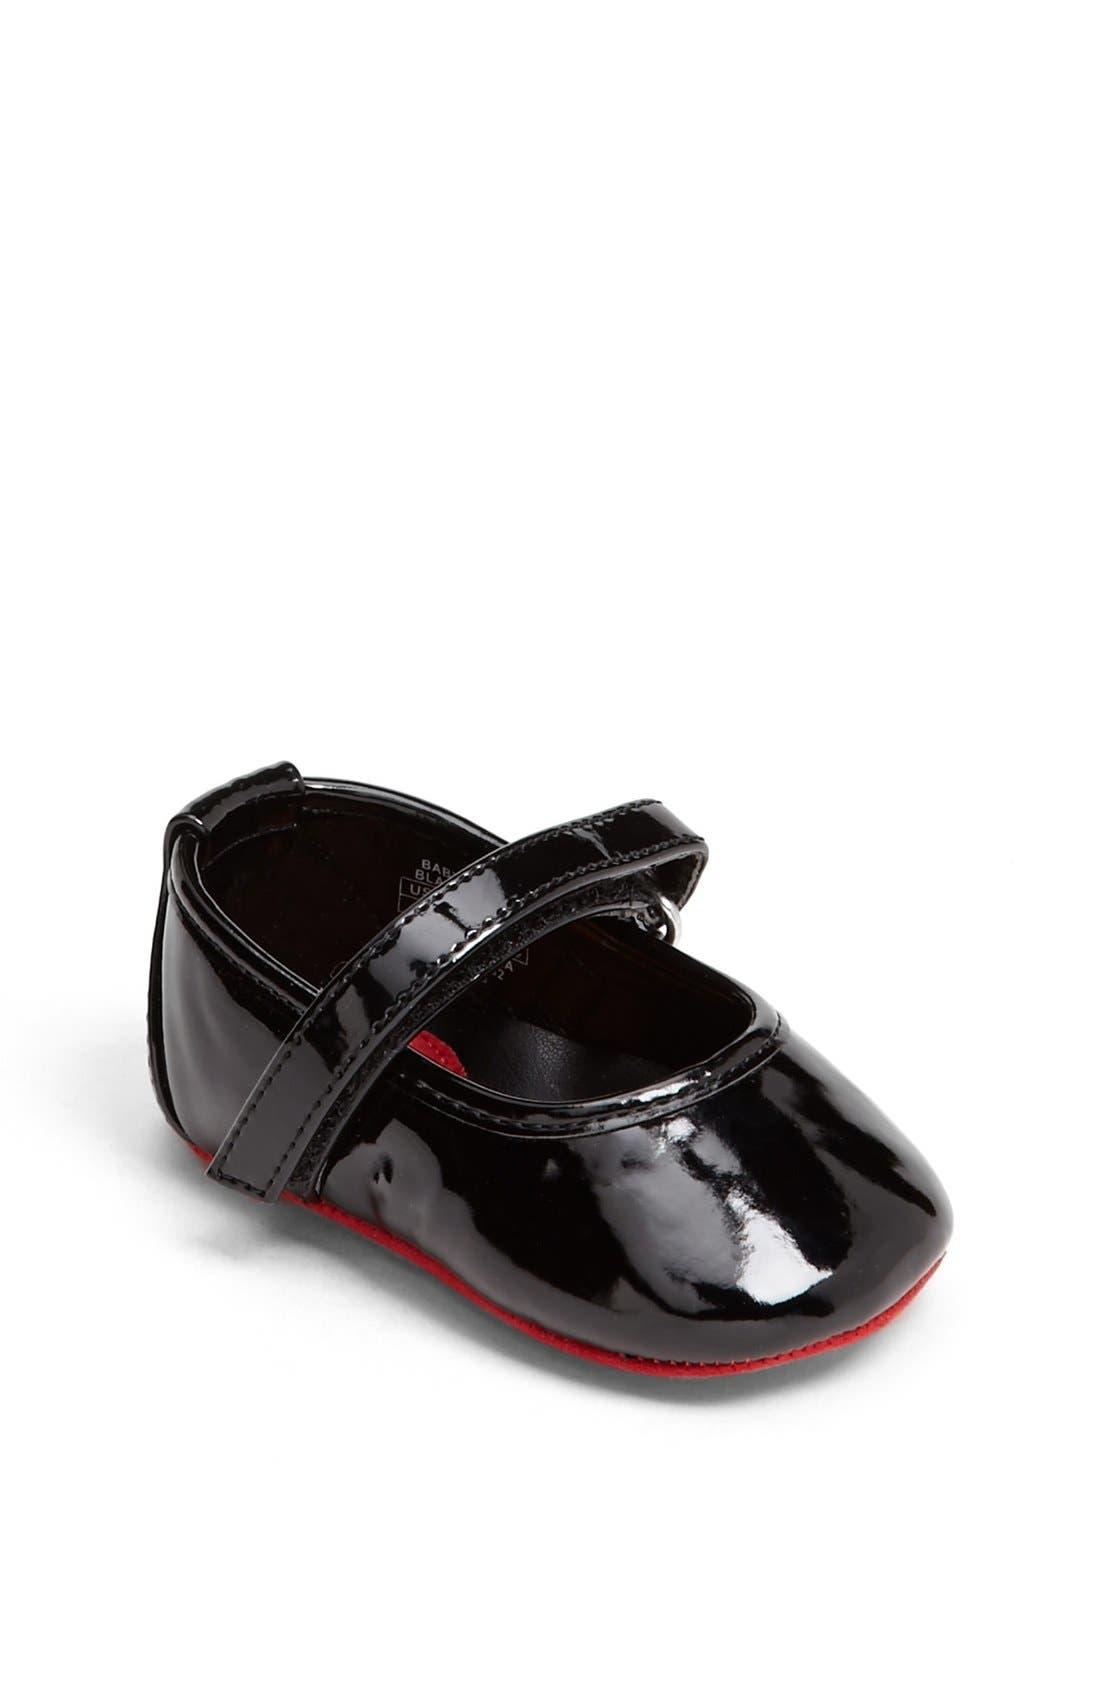 Alternate Image 1 Selected - Stuart Weitzman 'Baby Caviar' Patent Crib Shoe (Baby)